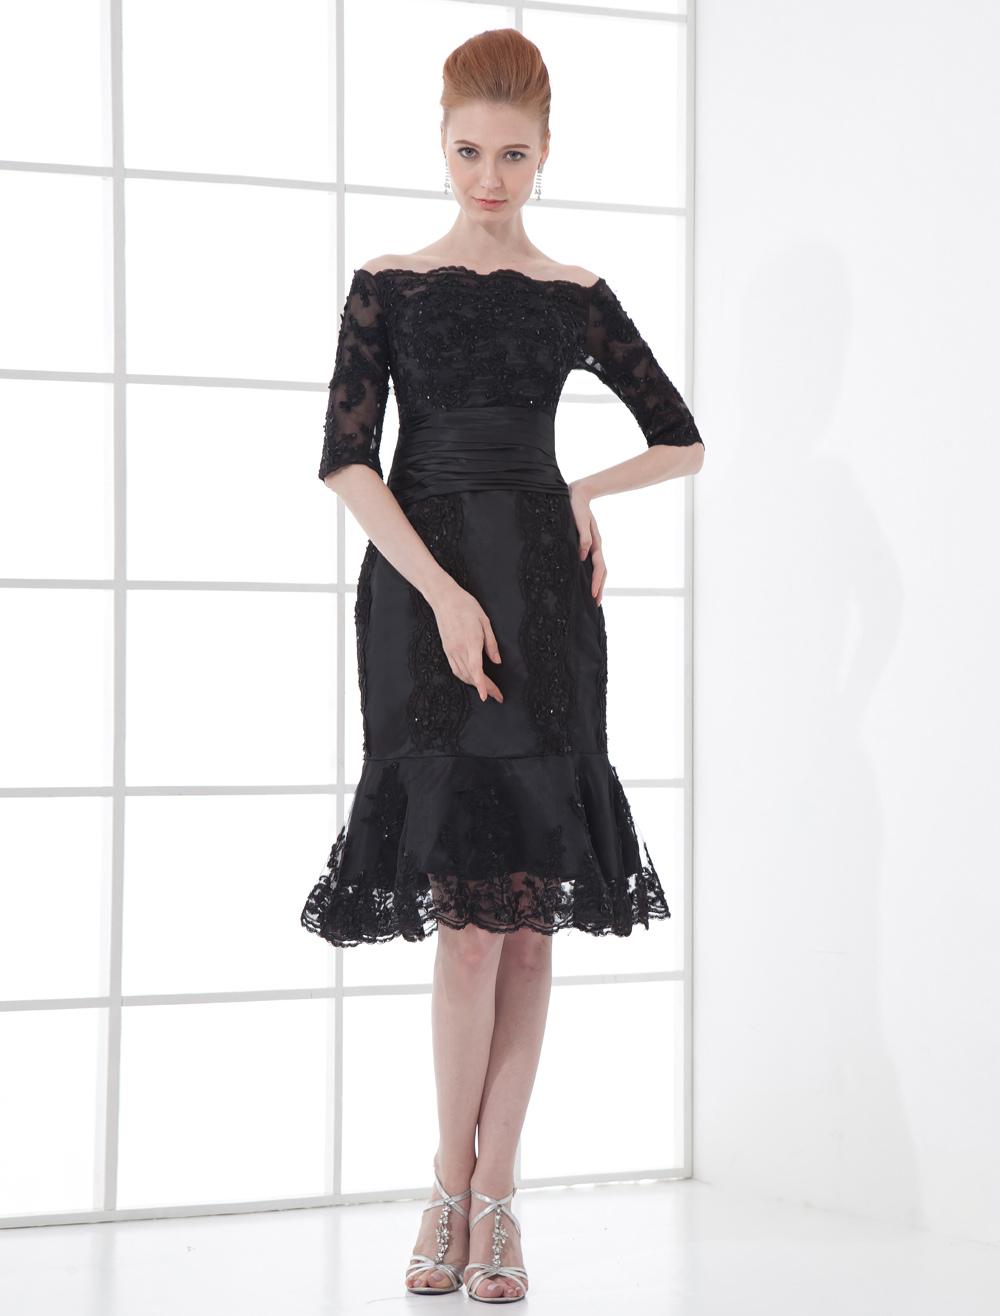 Gorgeous Black Bateau Neck Lace Knee Length Mermaid Cocktail Dress Wedding Guest Dress Milanoo Com,Womens Wedding Guest Dresses Fall